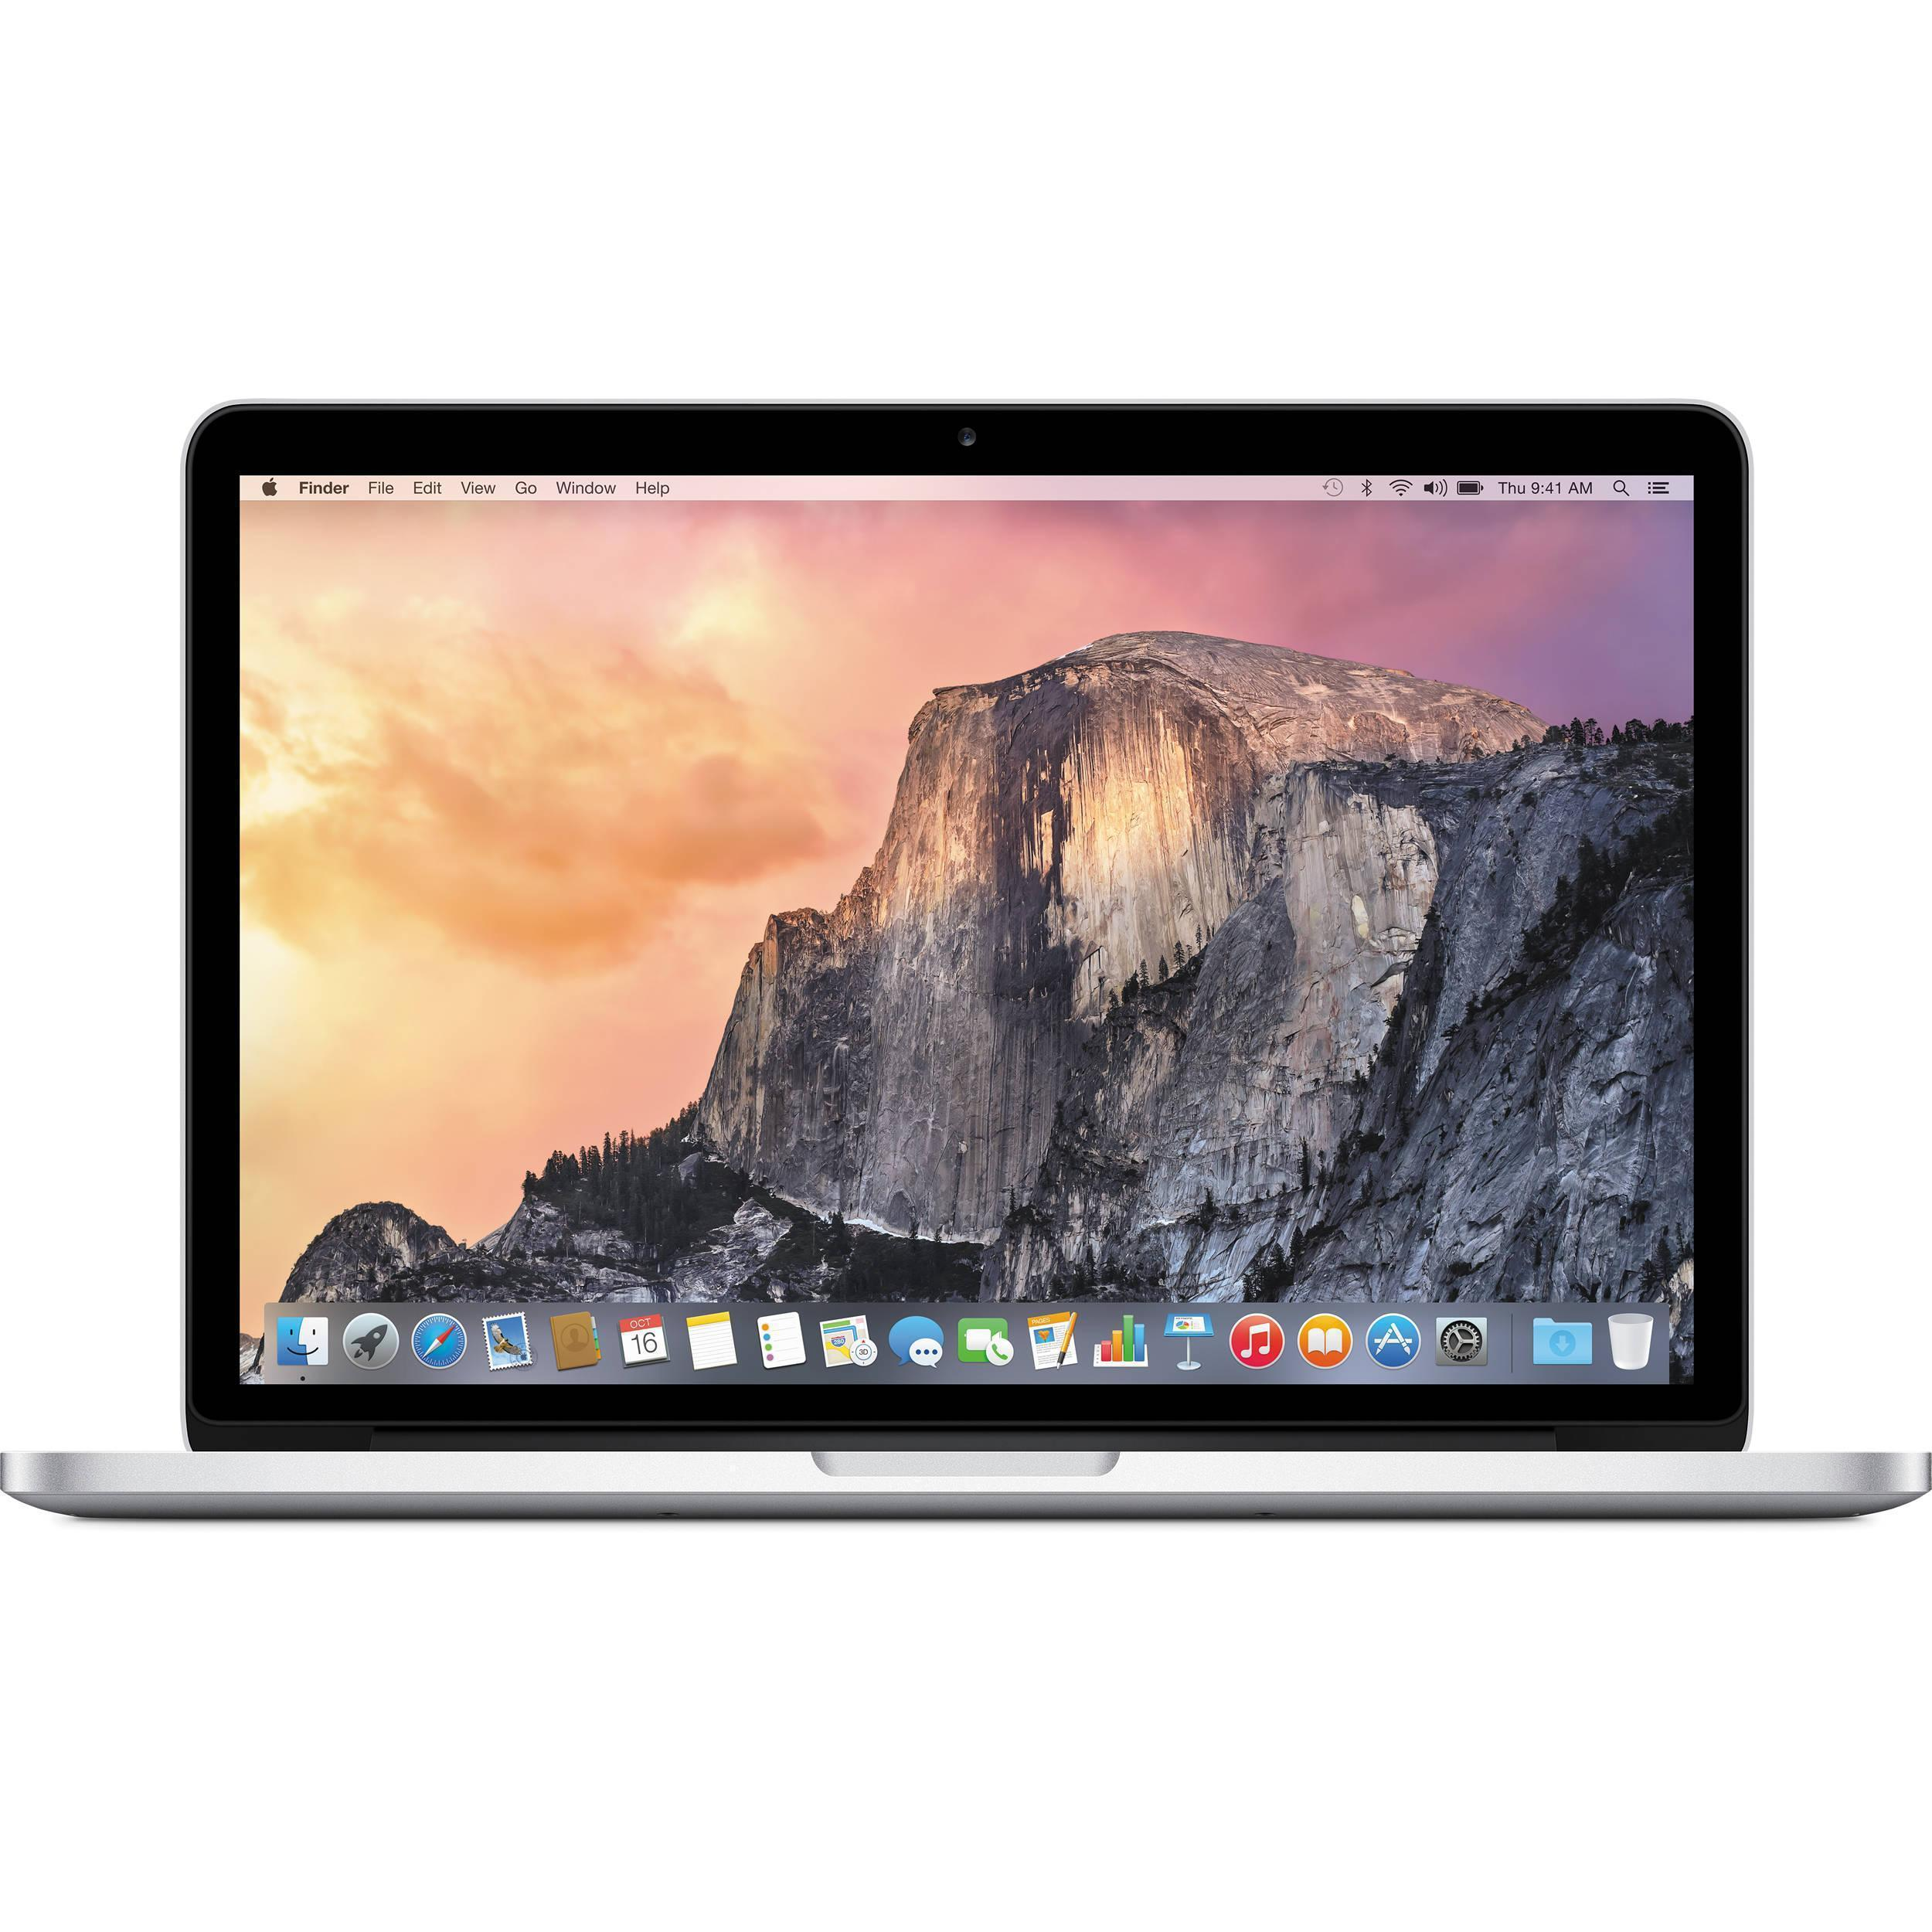 MacBook Pro Retina 13.3-inch (2013) - Core i5 - 8GB - SSD 512 GB QWERTY